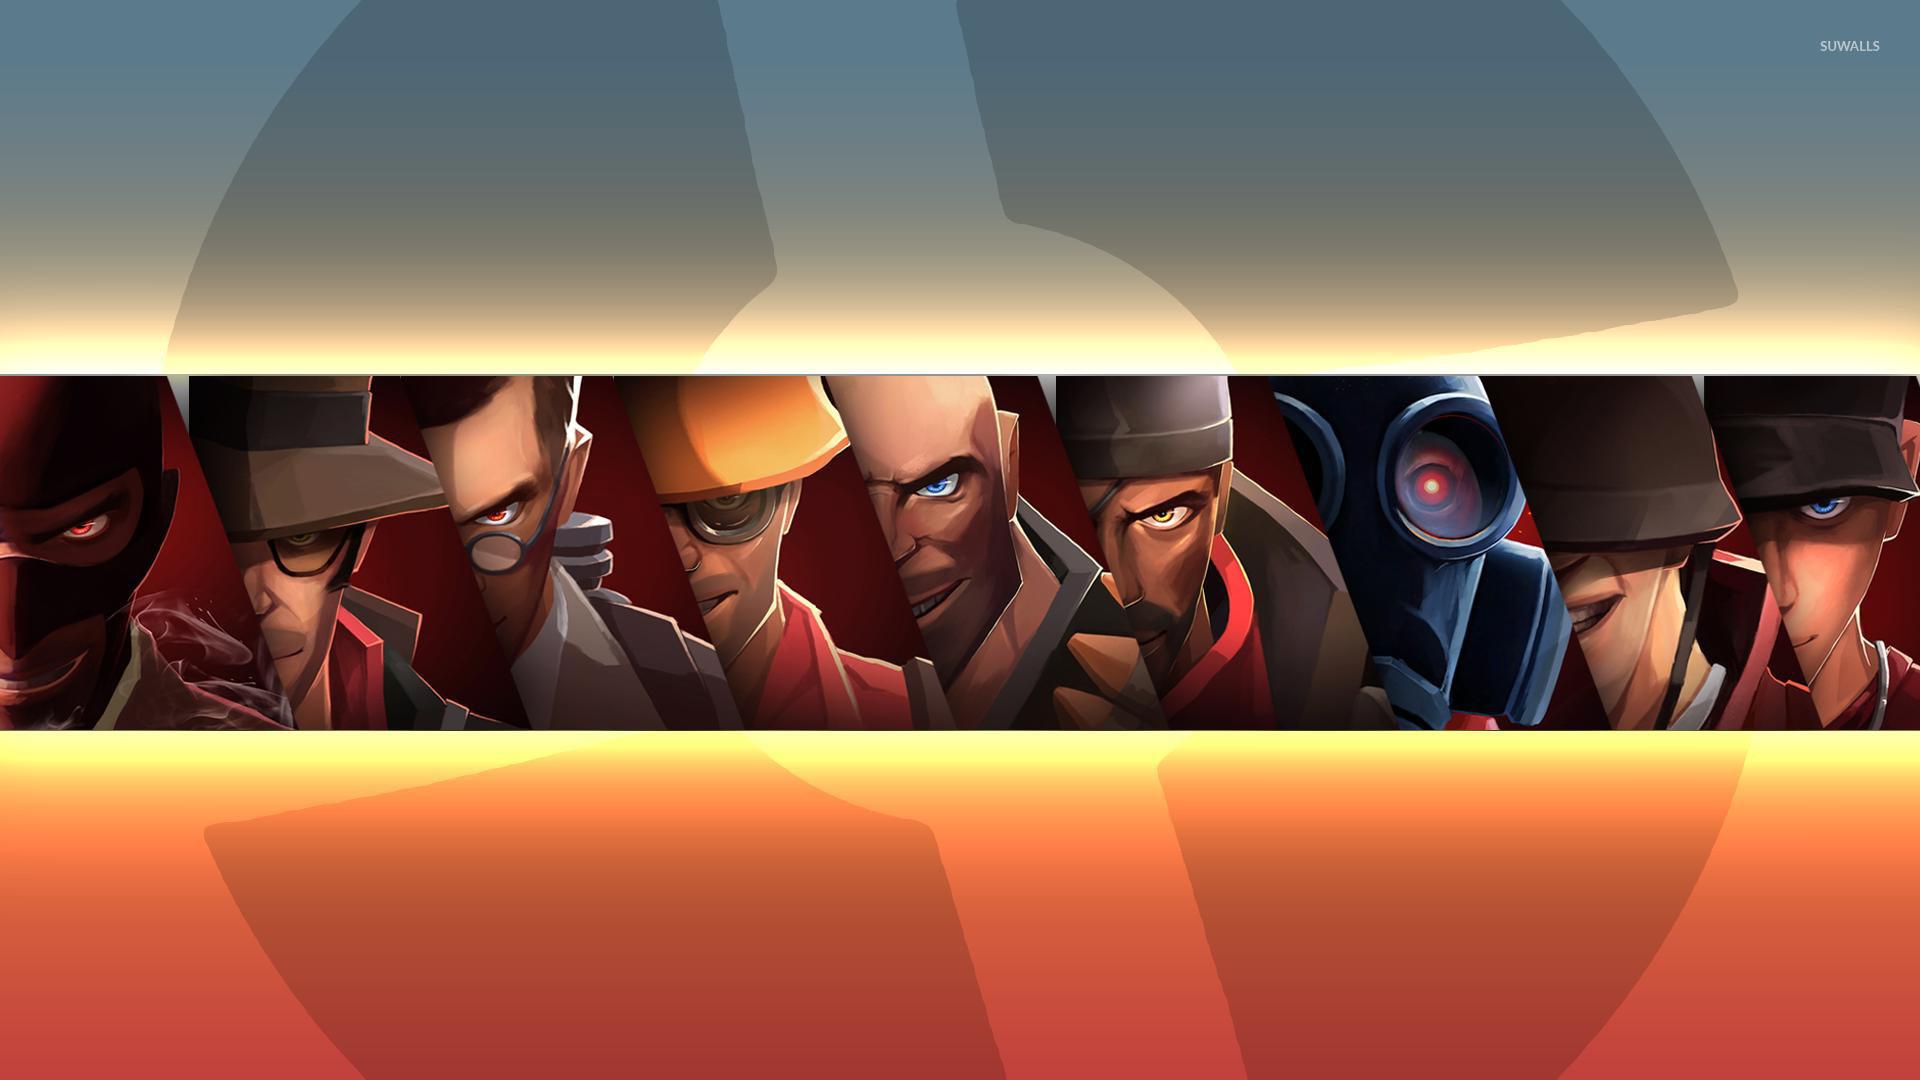 Team Fortress 2 [6] wallpaper